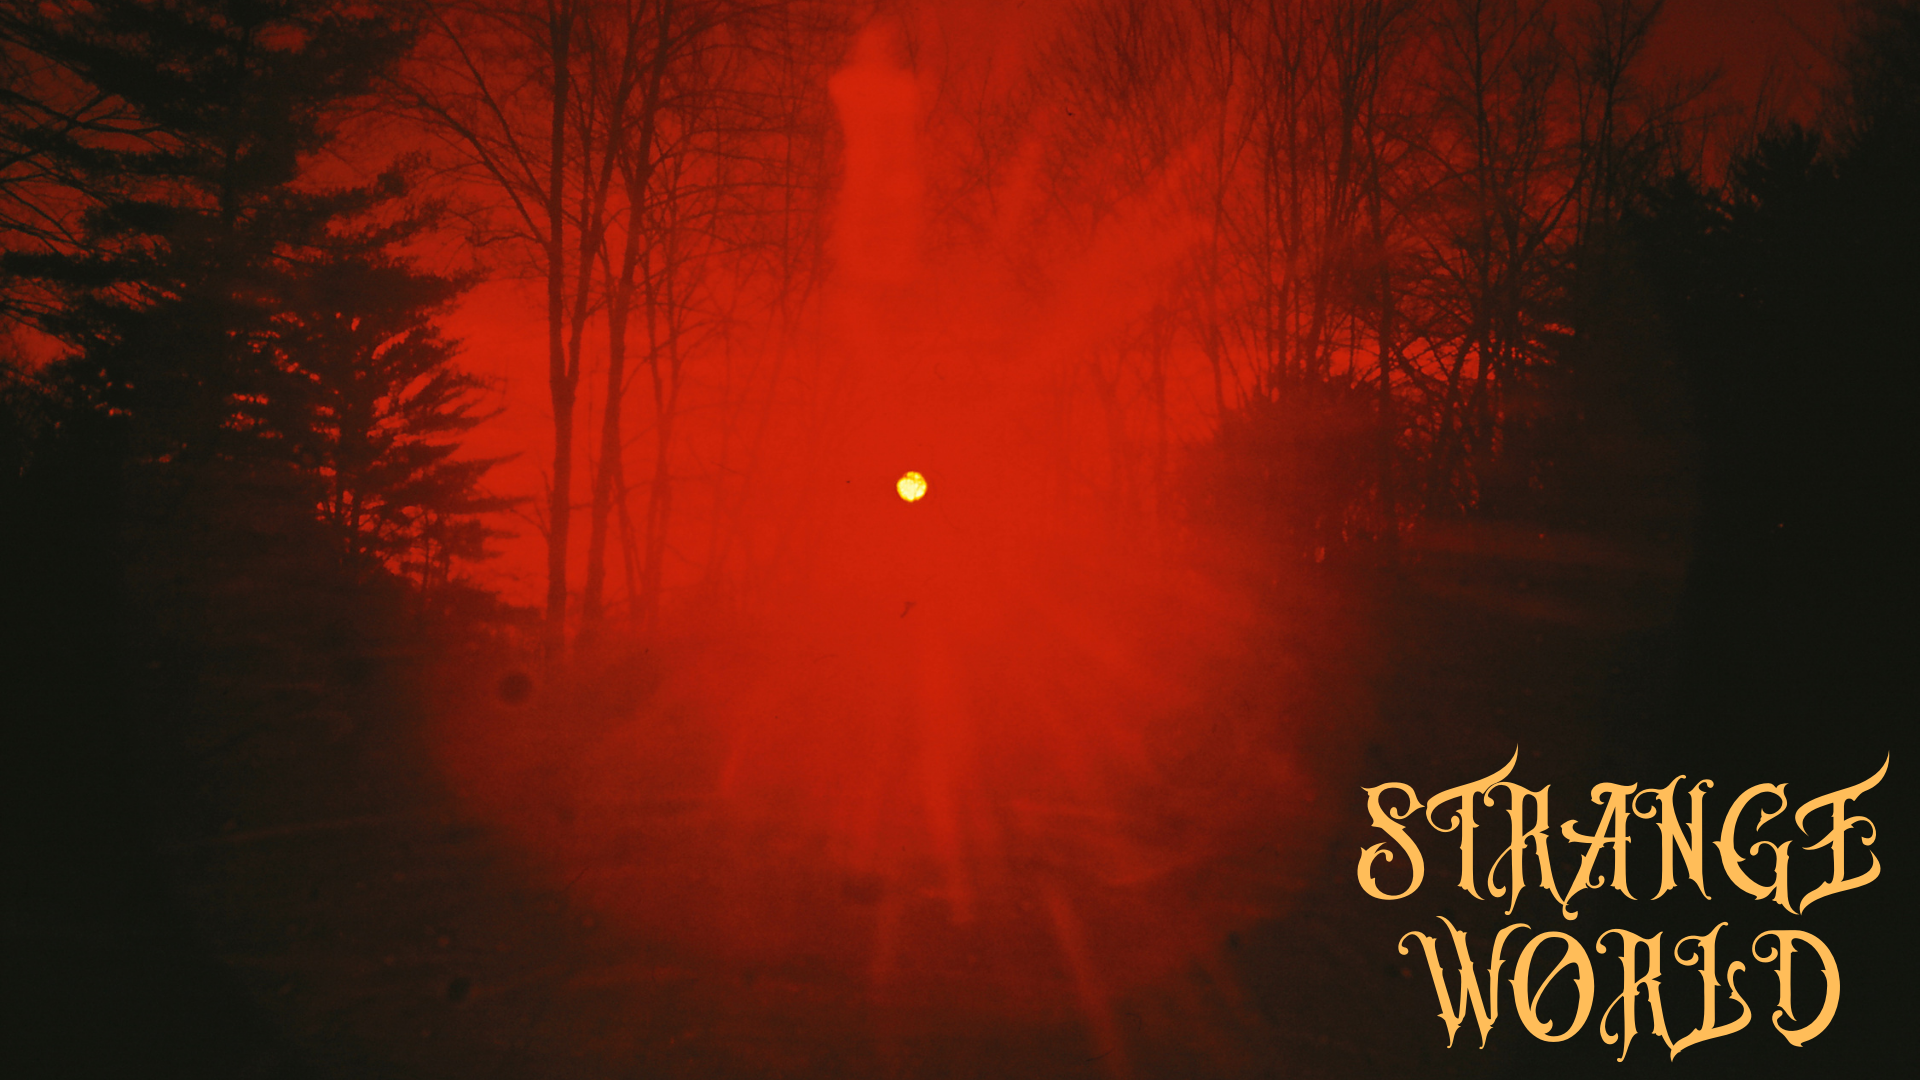 Thumbnail for Ep. #424: Strange World w/ Nick Redfern